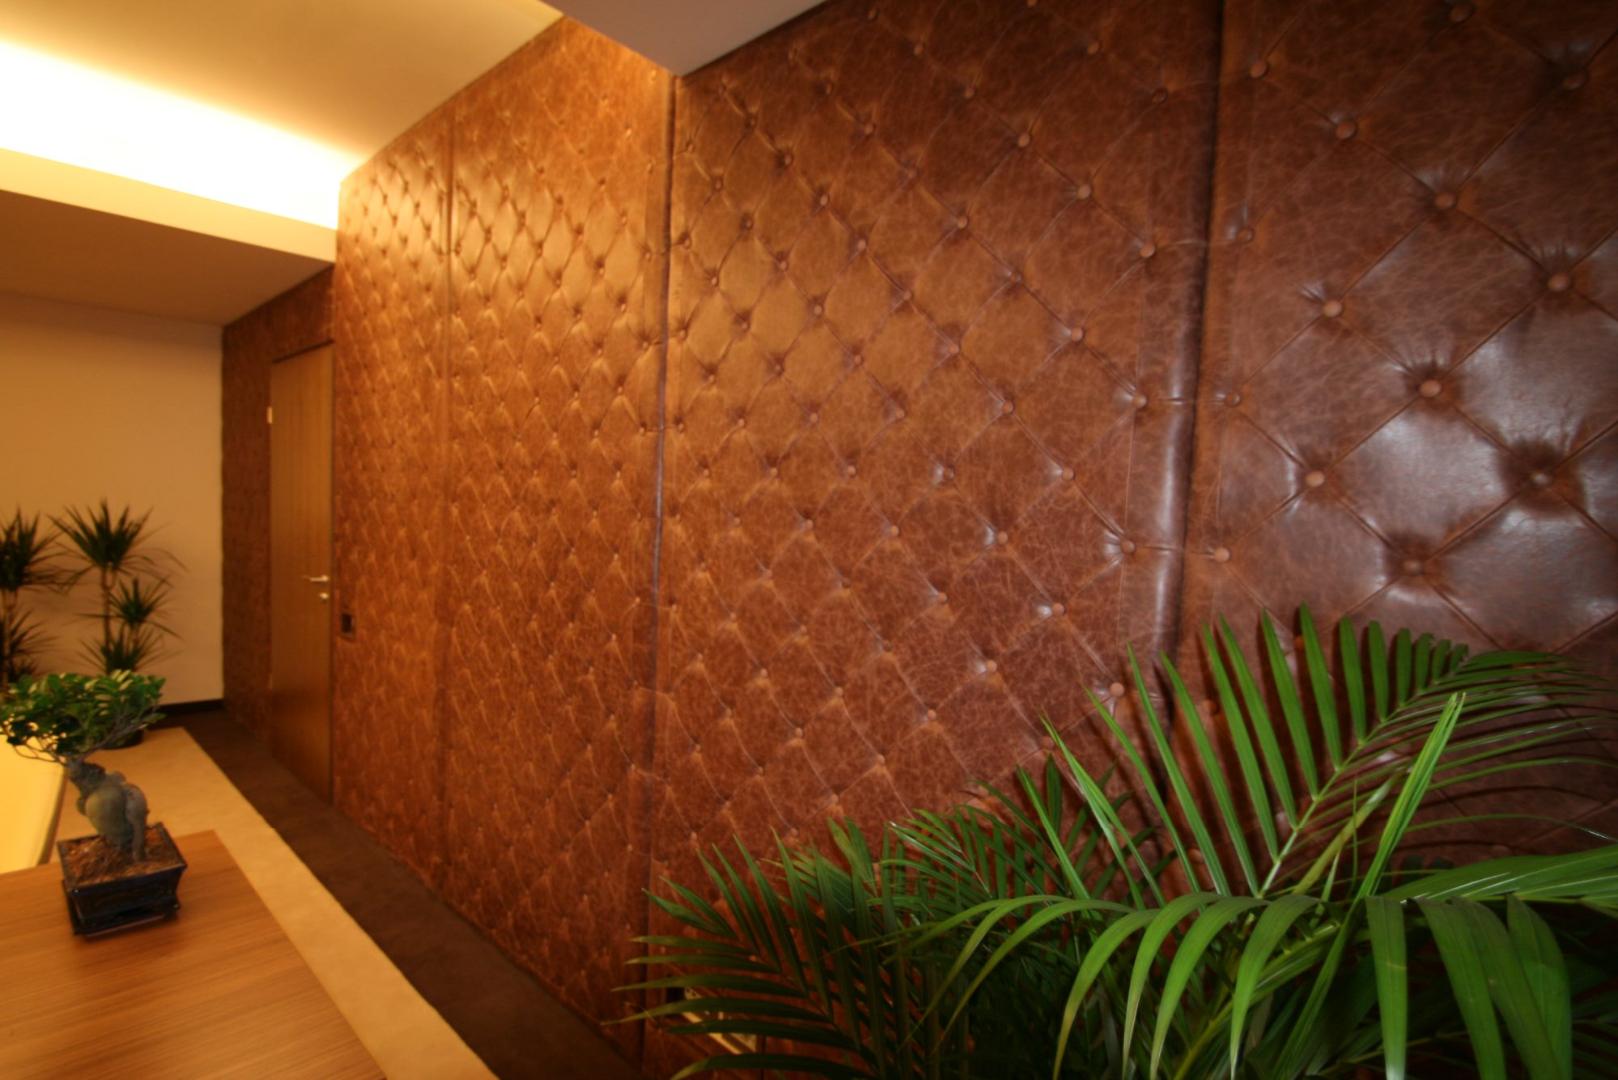 placari pereti corian iluminat led receptie corian termoformat furnir tavan furnir nuc tridimensional mobilier trafoare atipic depa014